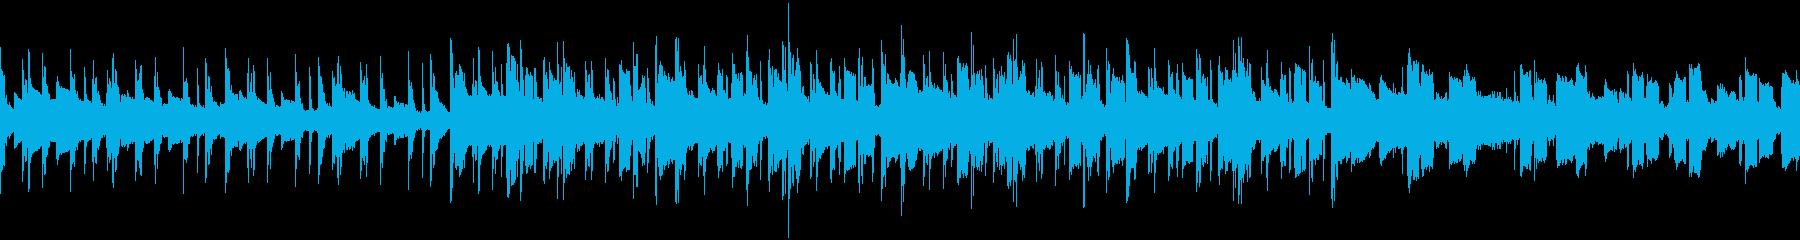 (Loop)ふんわりチルアウト系の再生済みの波形